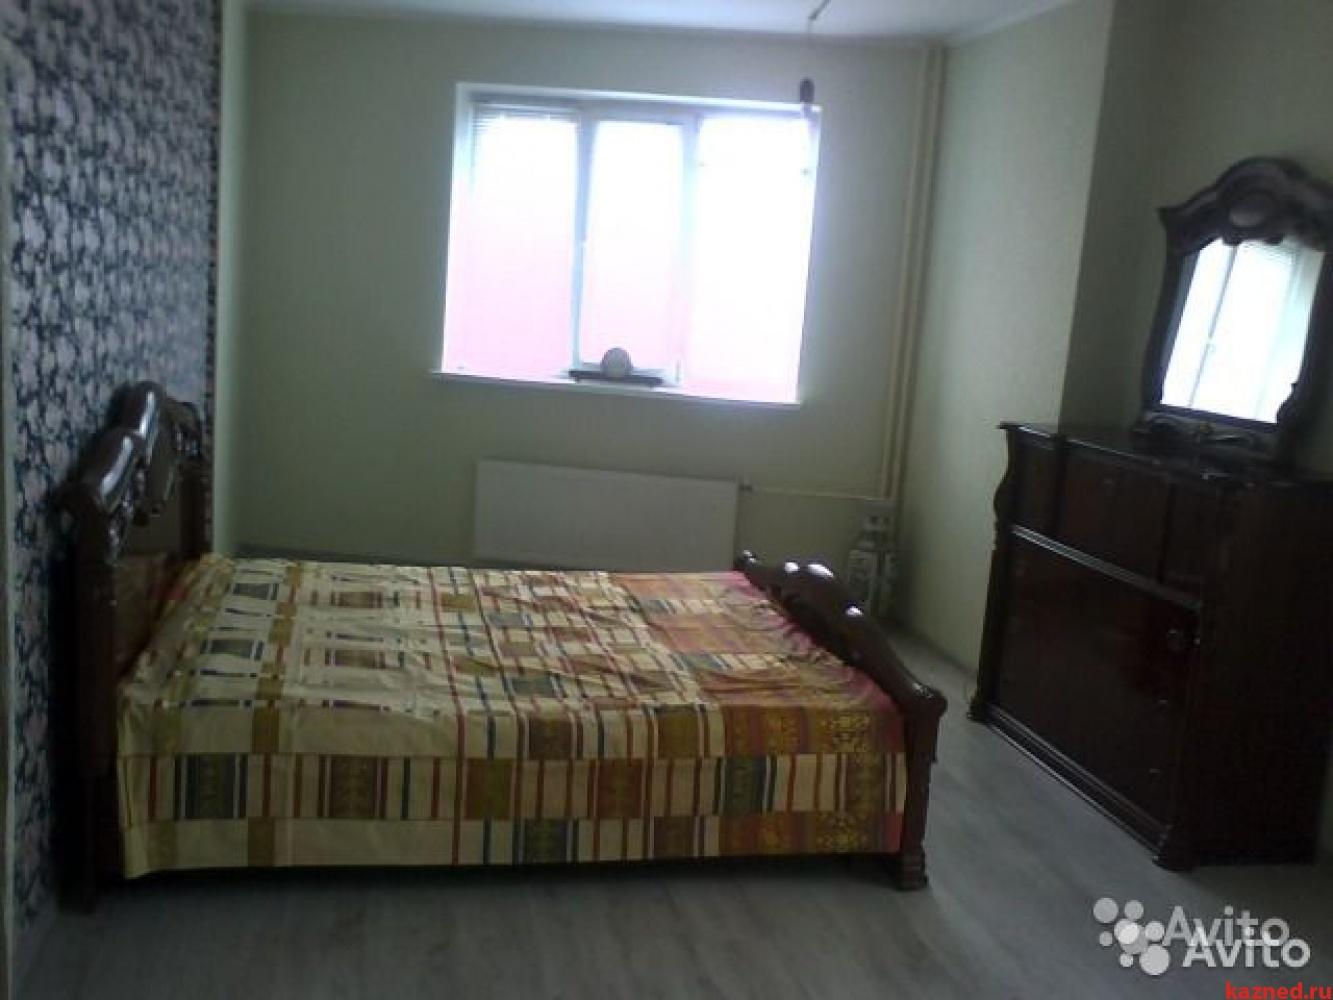 Продажа 2-к квартиры Юлиуса Фучика, 2Б, 66 м2  (миниатюра №6)